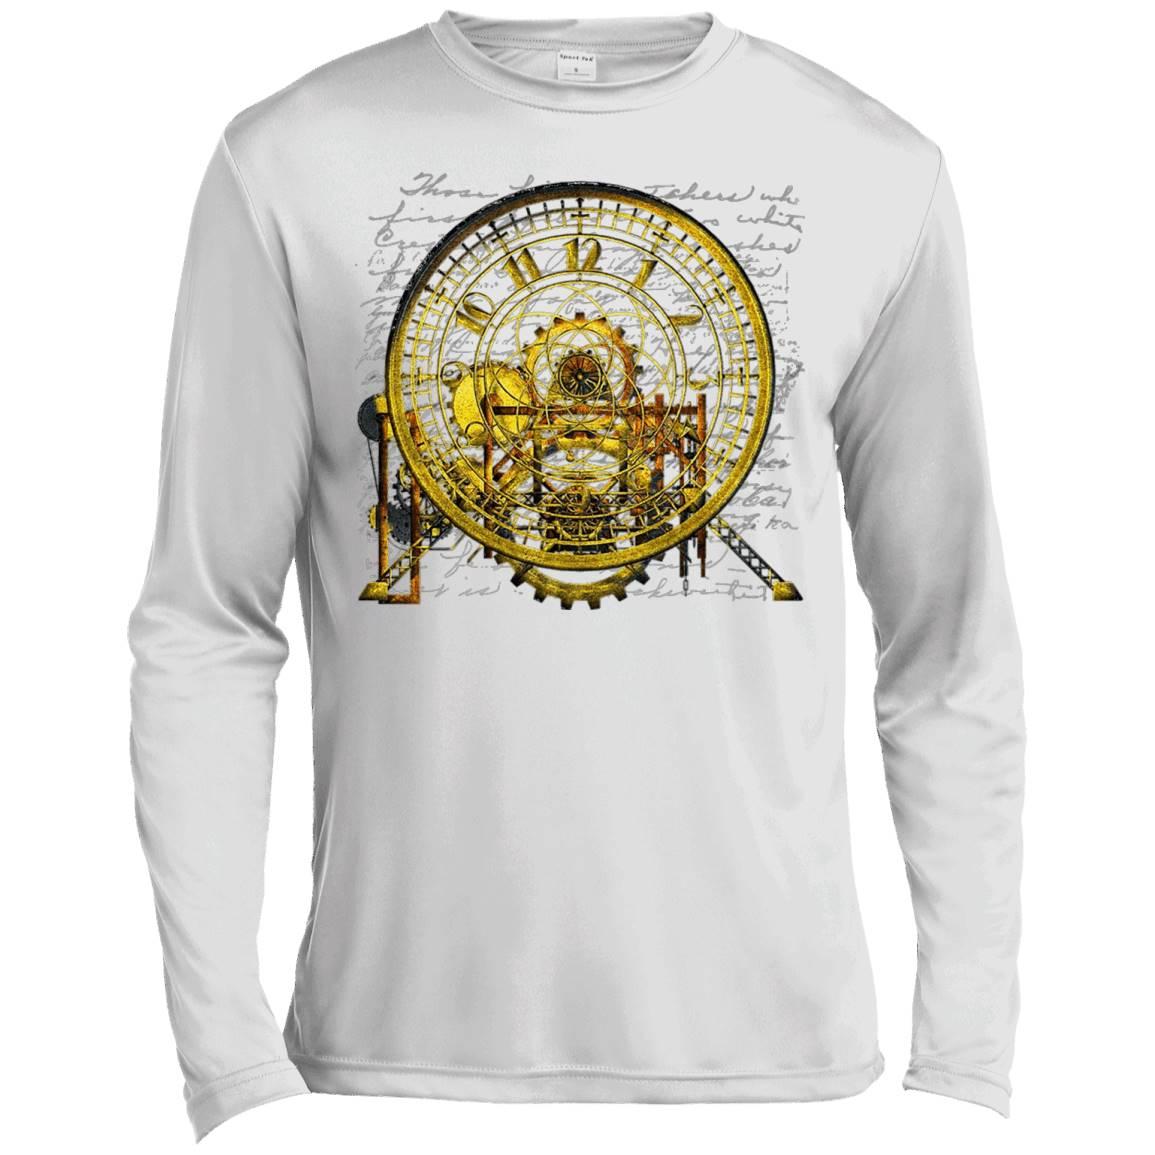 Steampunk Vintage Time Machine No.2 T-Shirts – Long Sleeve Tee